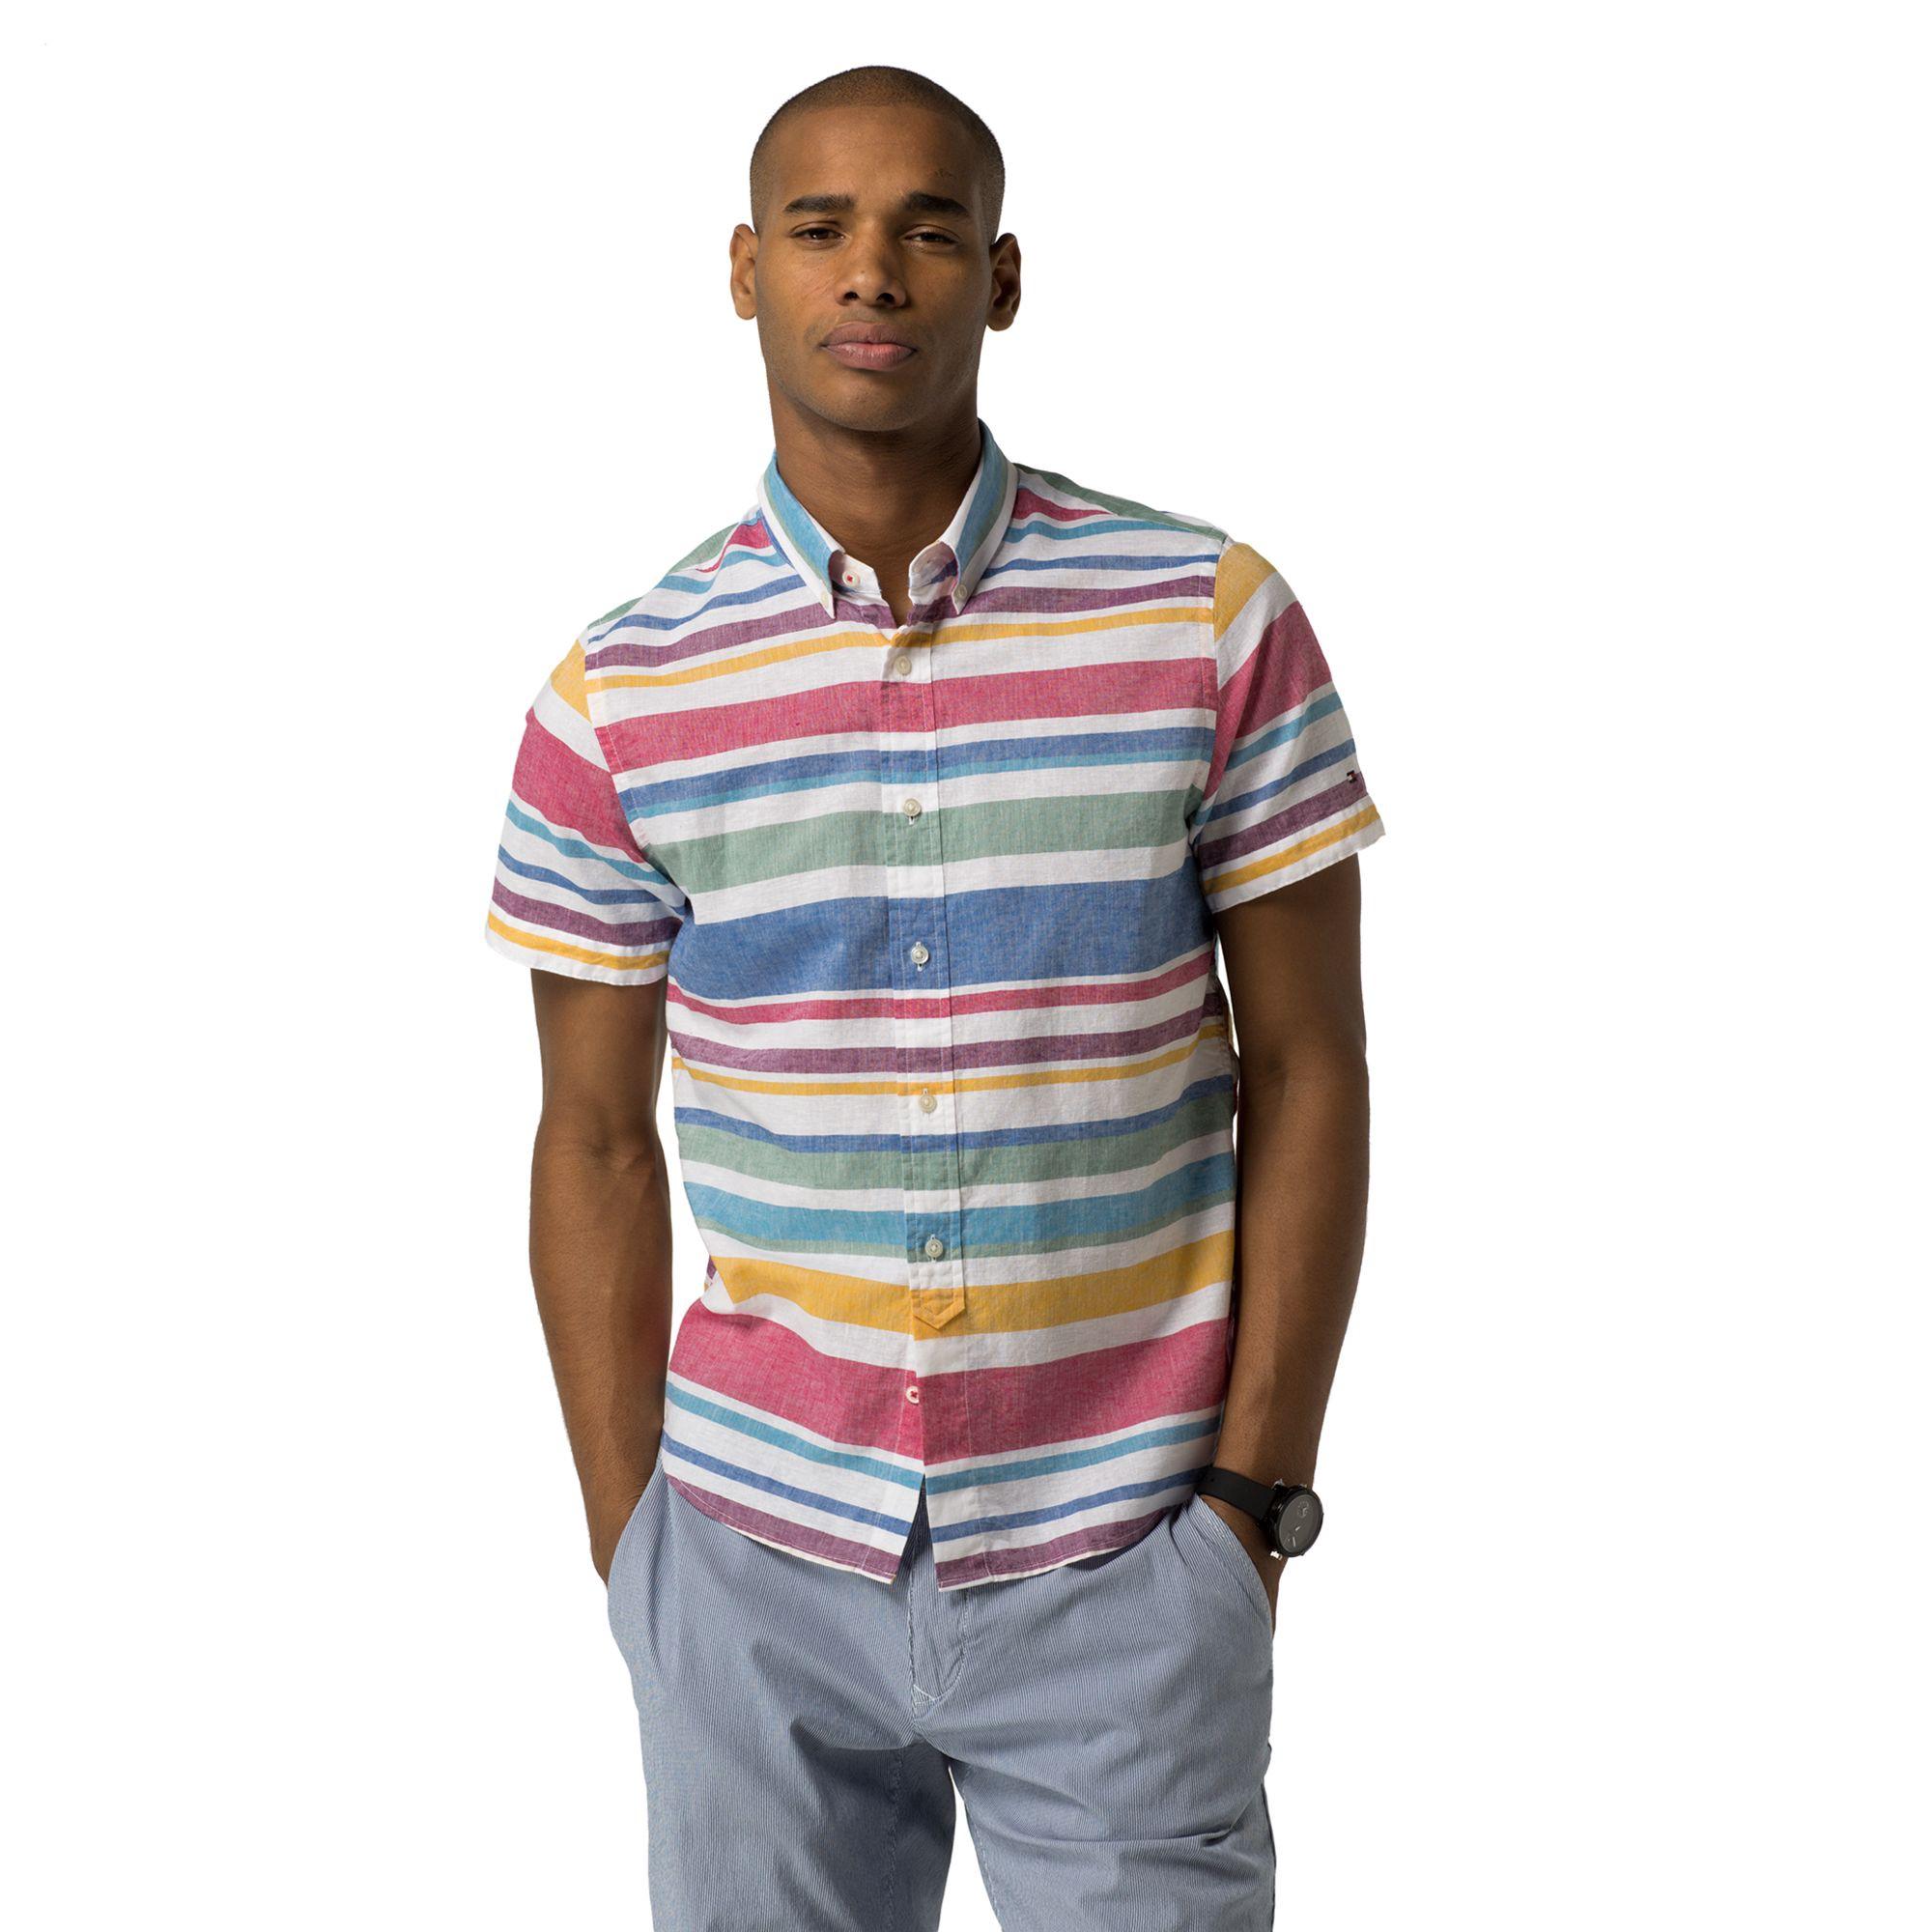 TOMMY HILFIGER Slim Fit Cotton + Linen Stripe Shirt - Frosty Spruce / Classic White / Multi